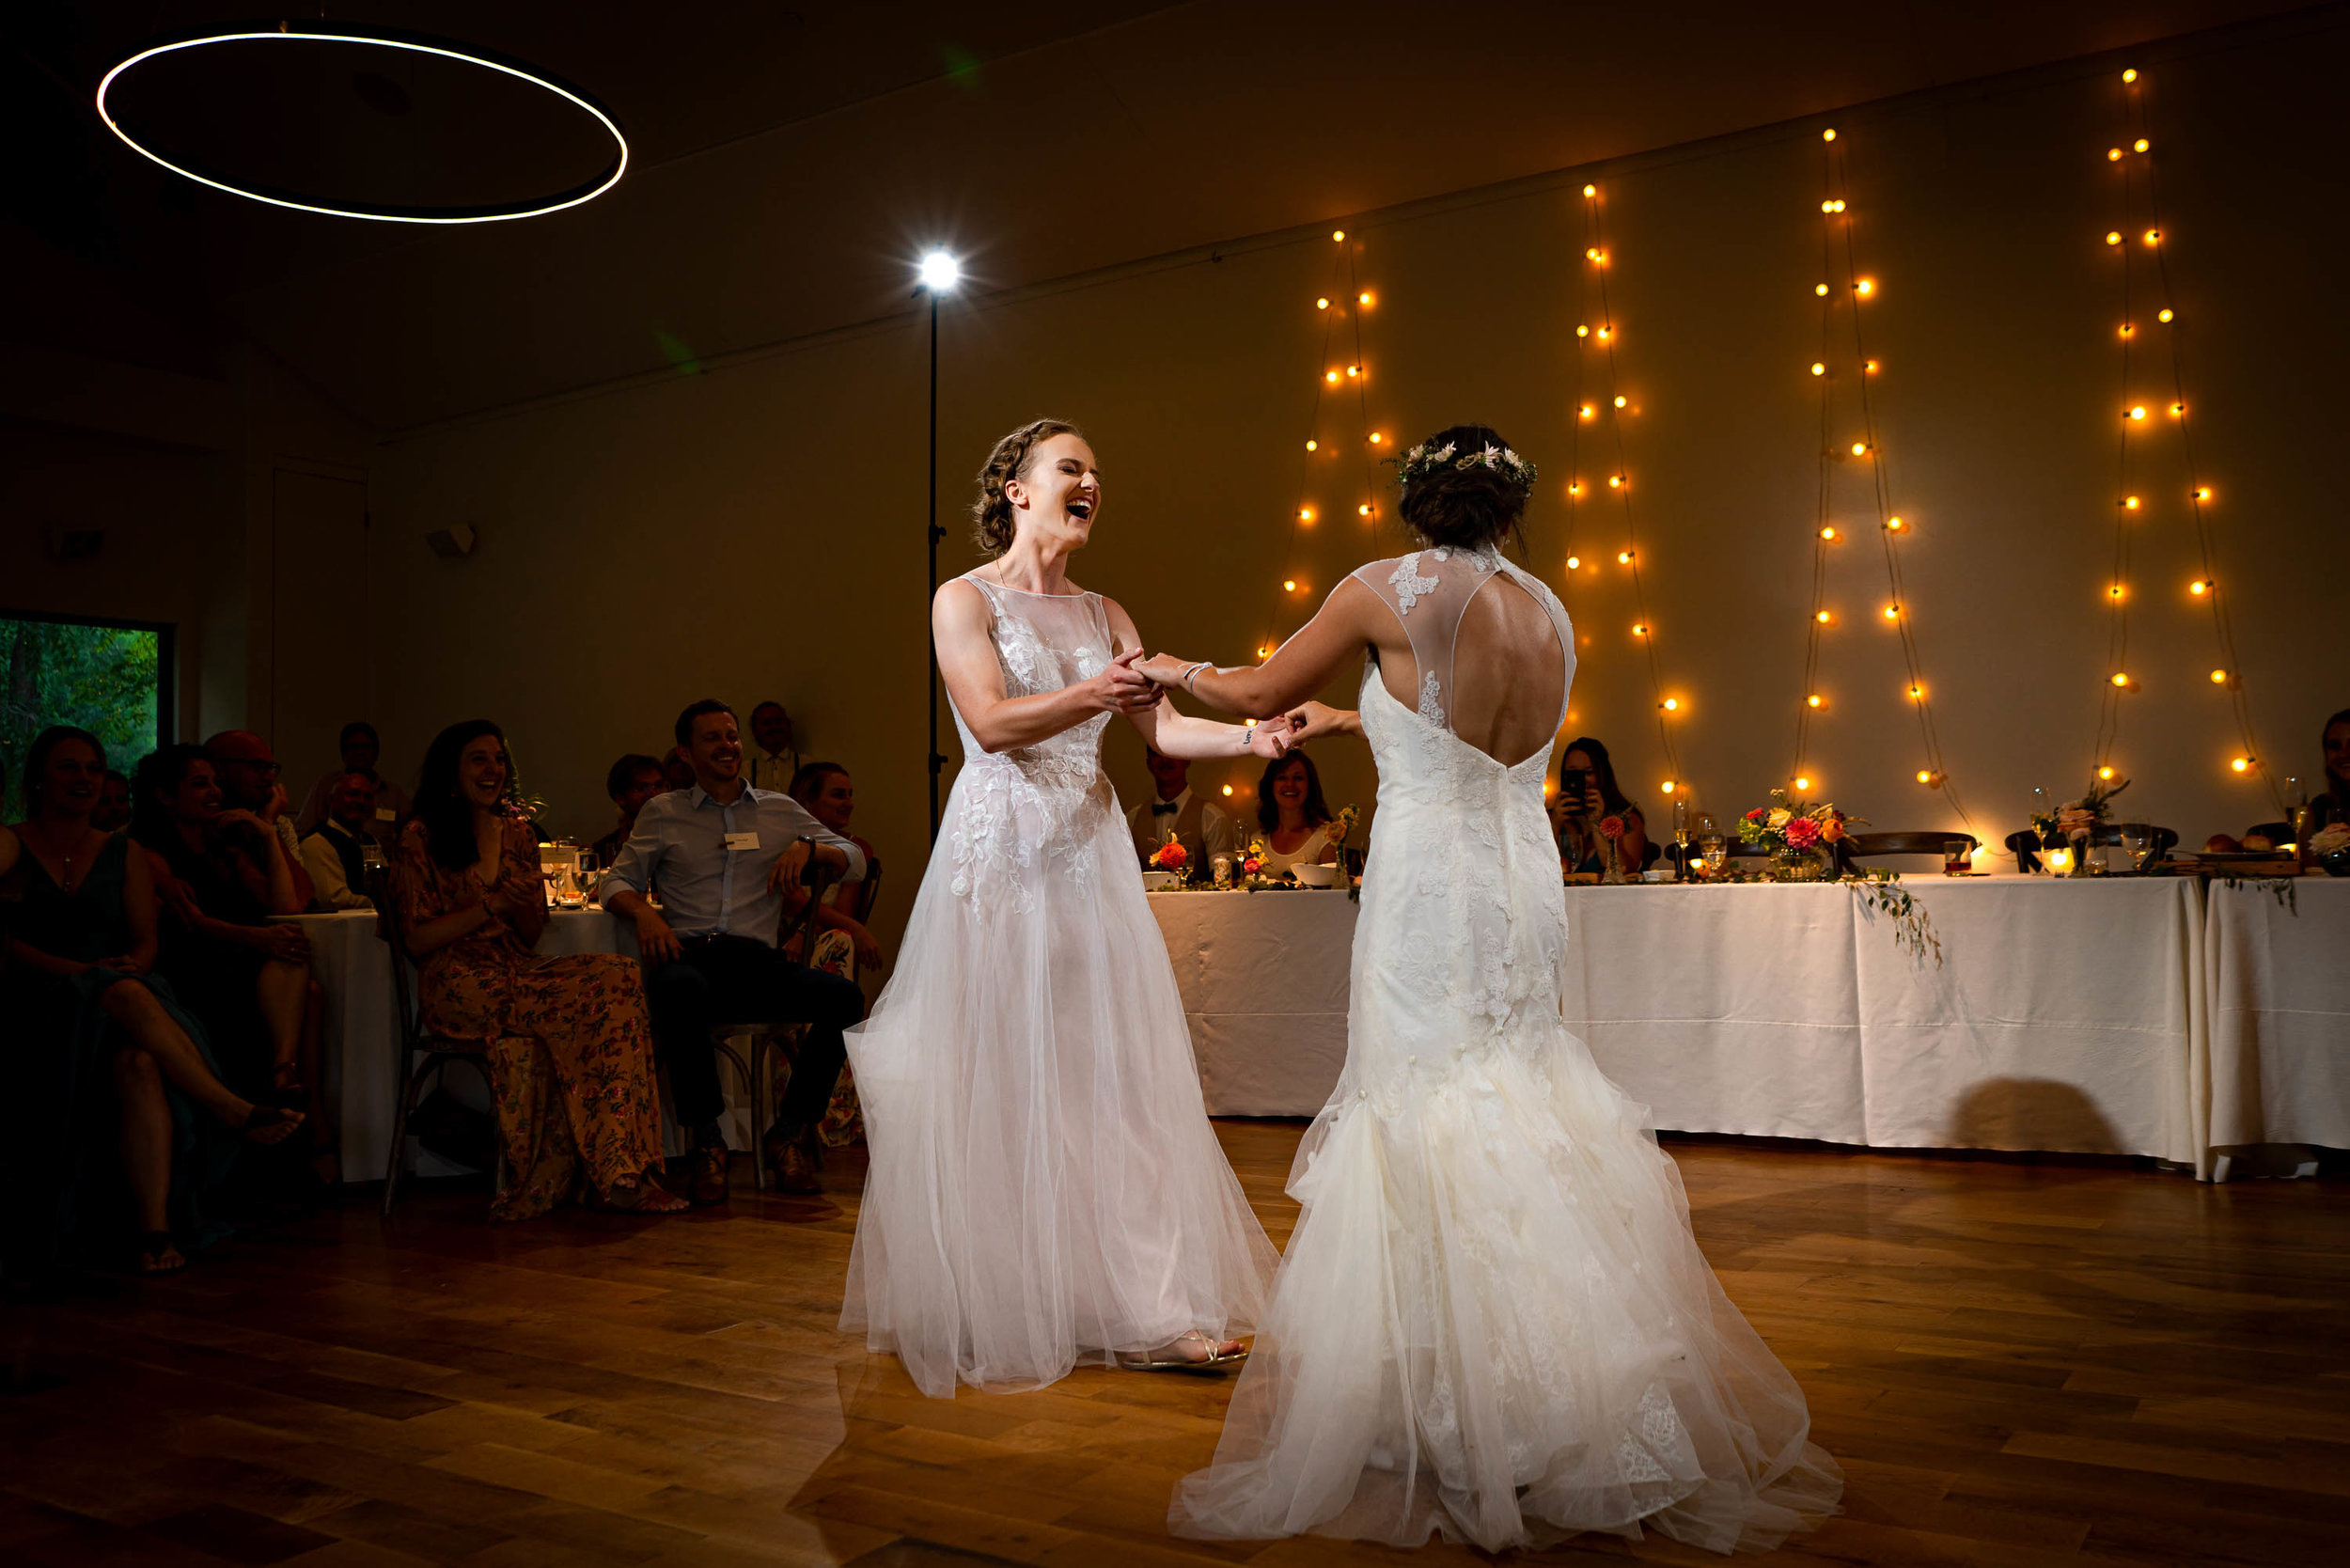 Rist_Canyon_Inn_Laporte_Wedding-162.jpg